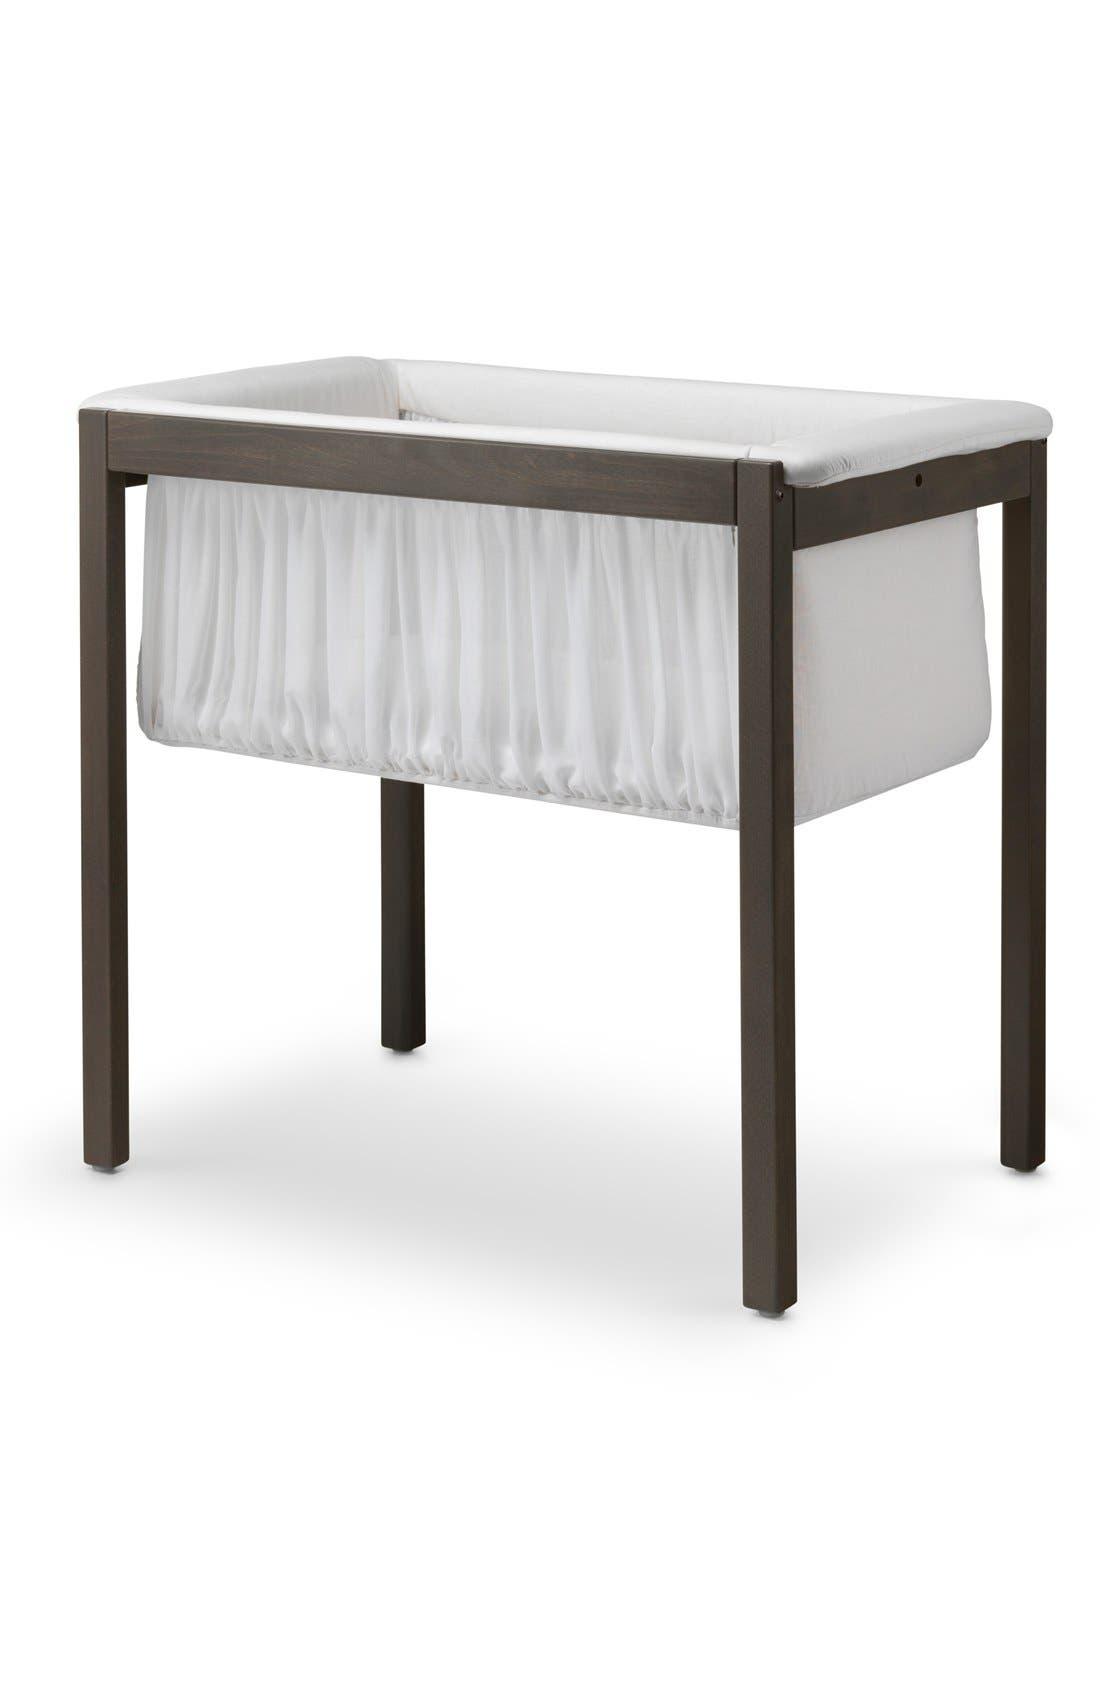 Main Image - Stokke 'Home™' Cradle